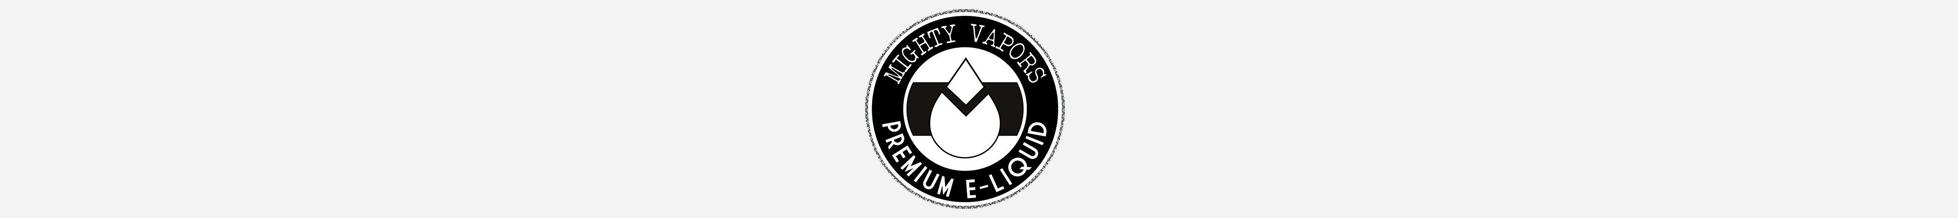 mighty-vapors-salt.jpg